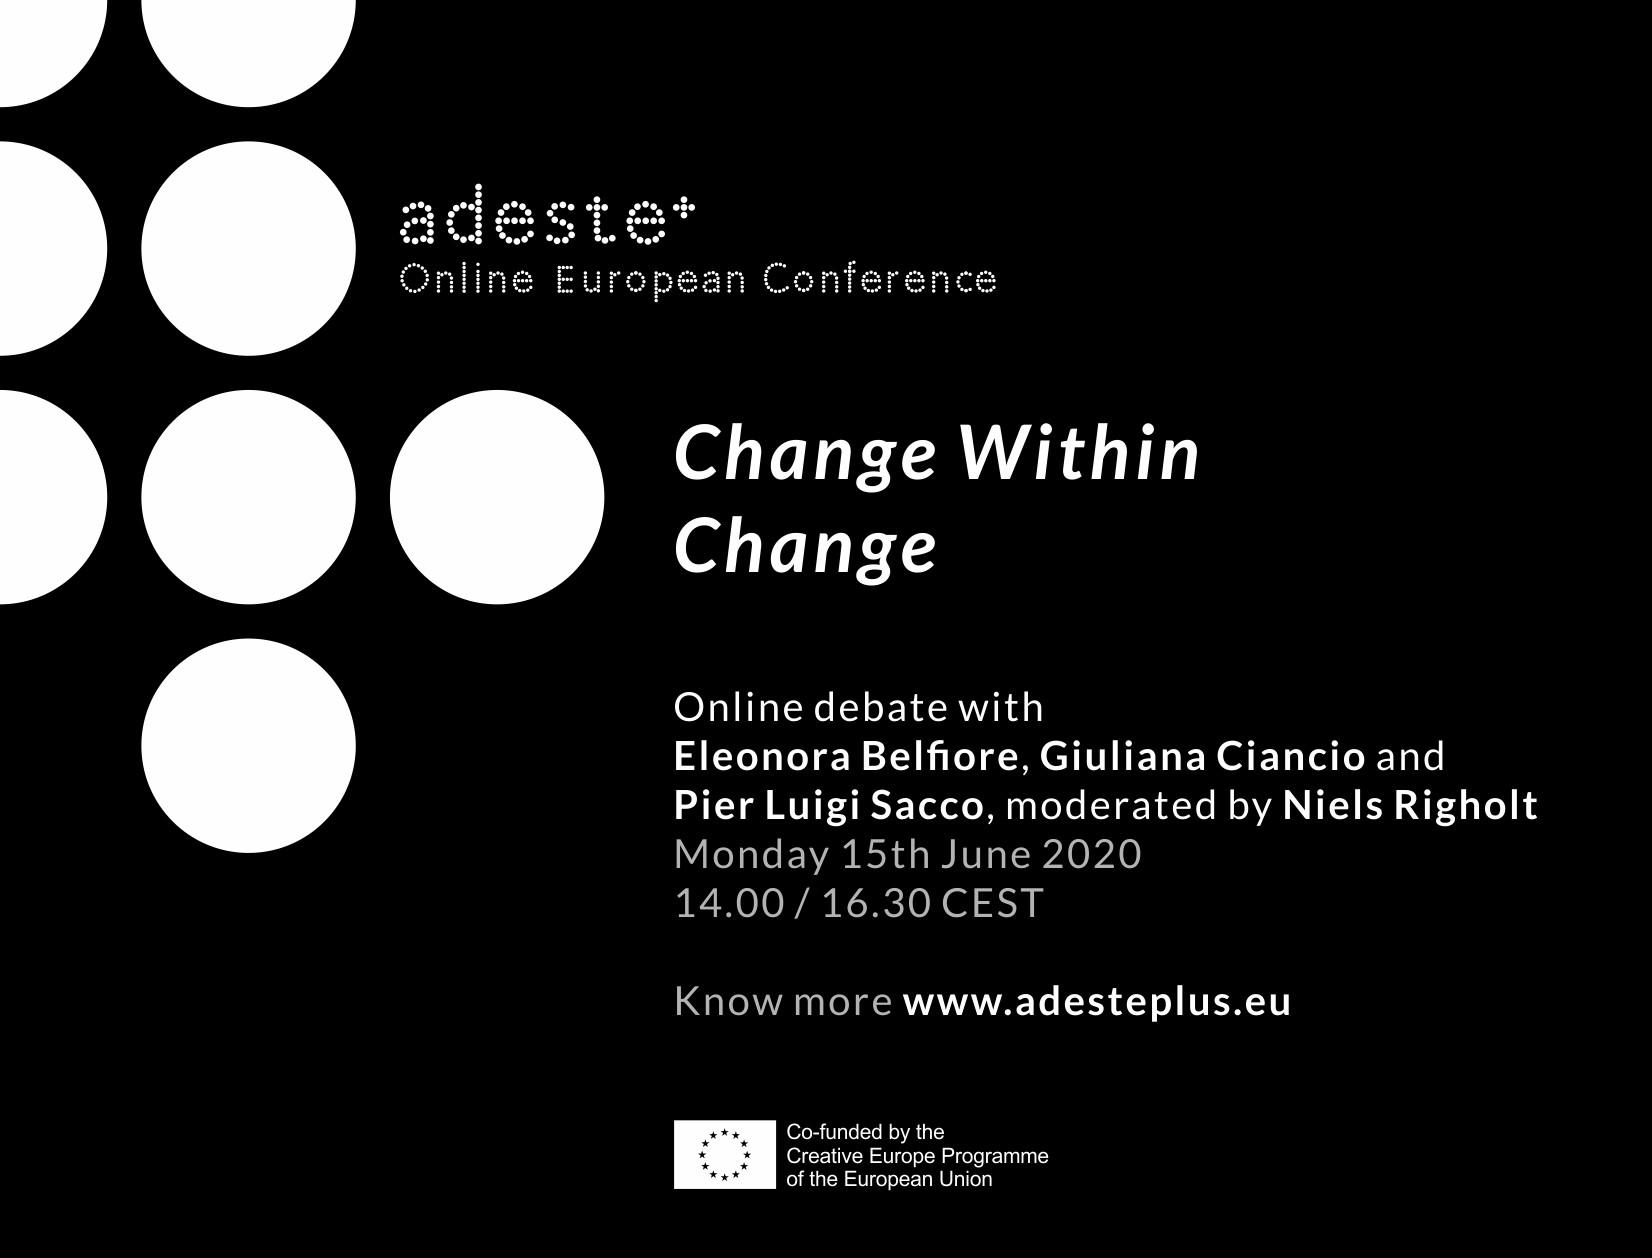 Change within Change